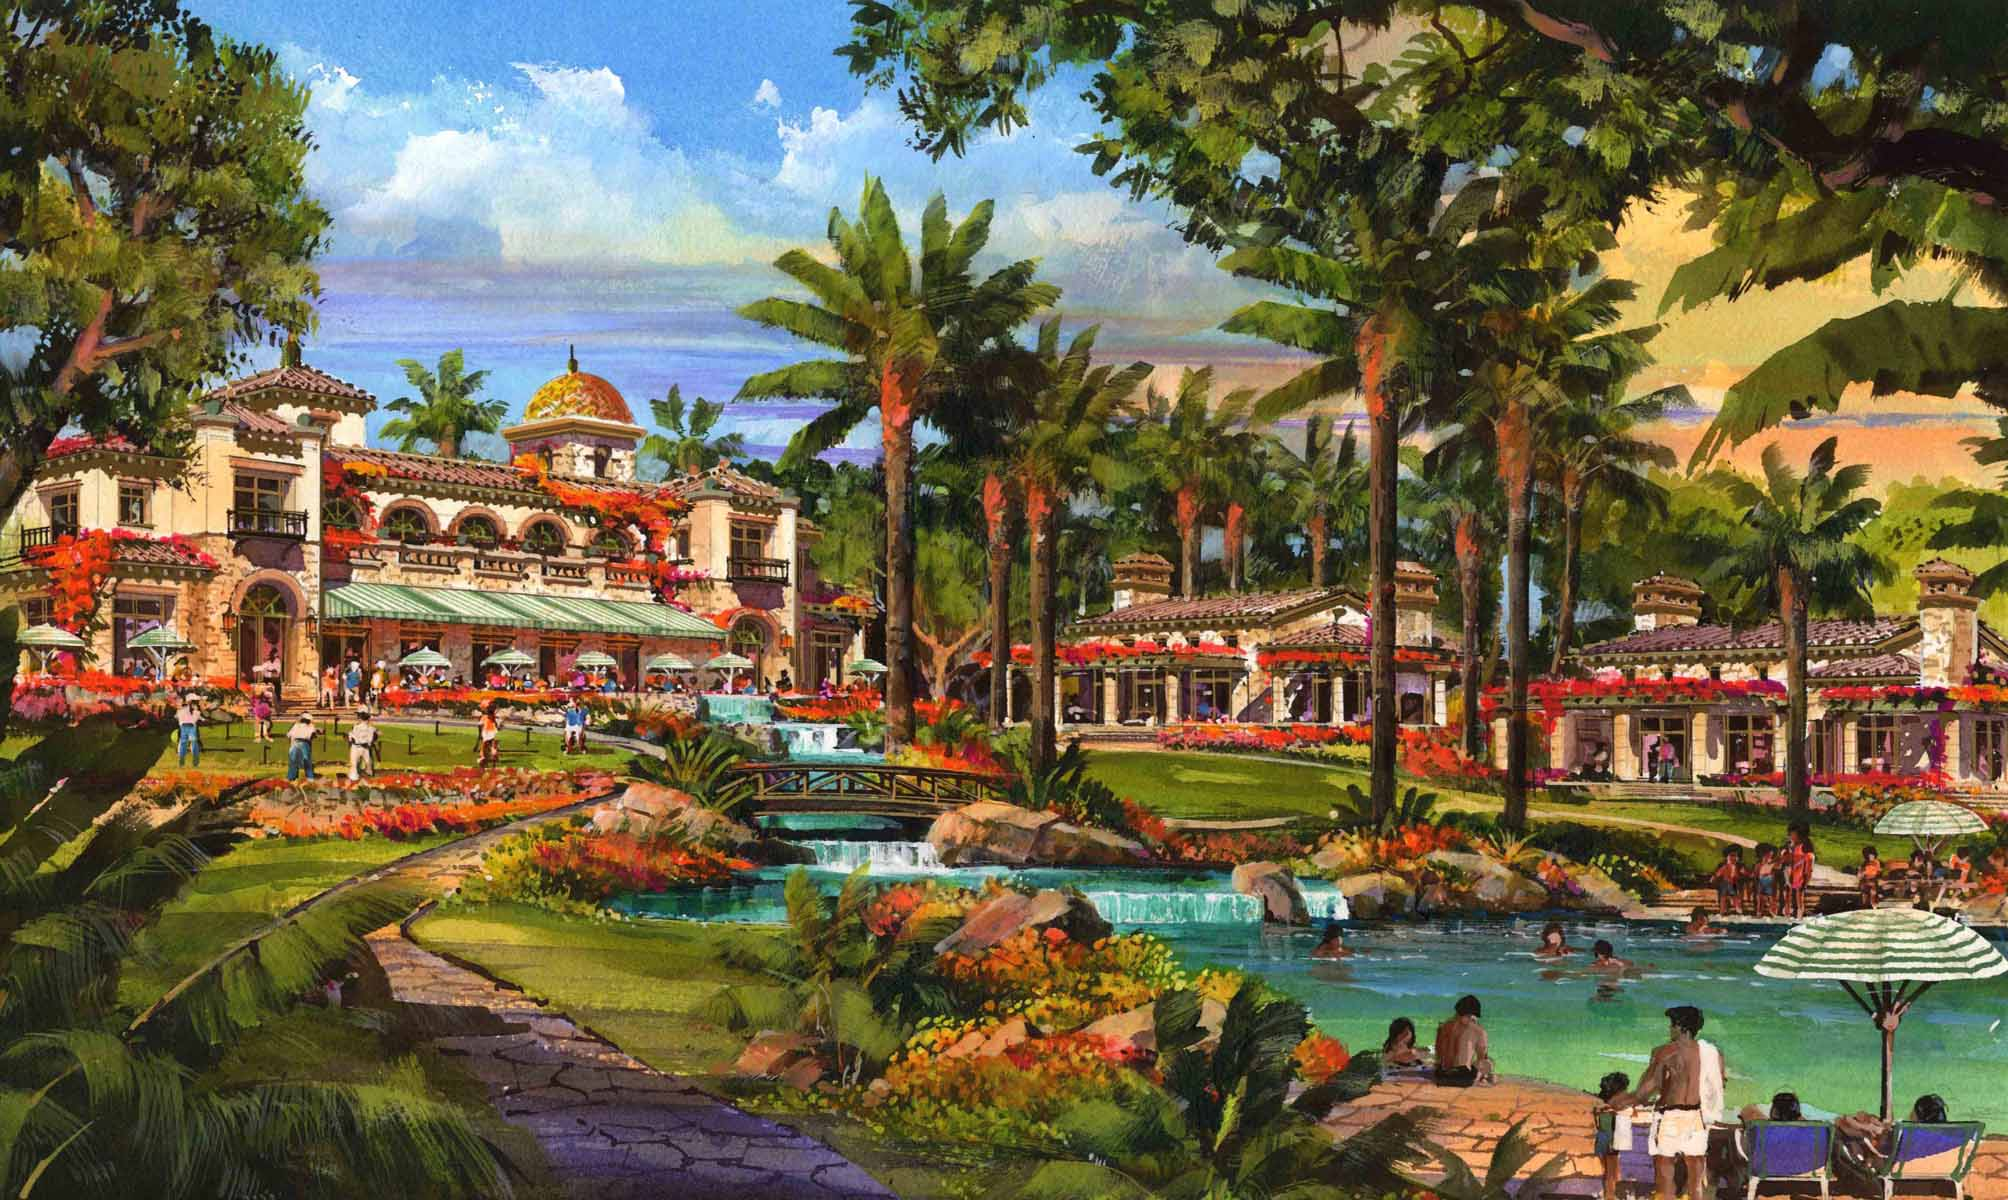 Hotel_Resort006.jpg